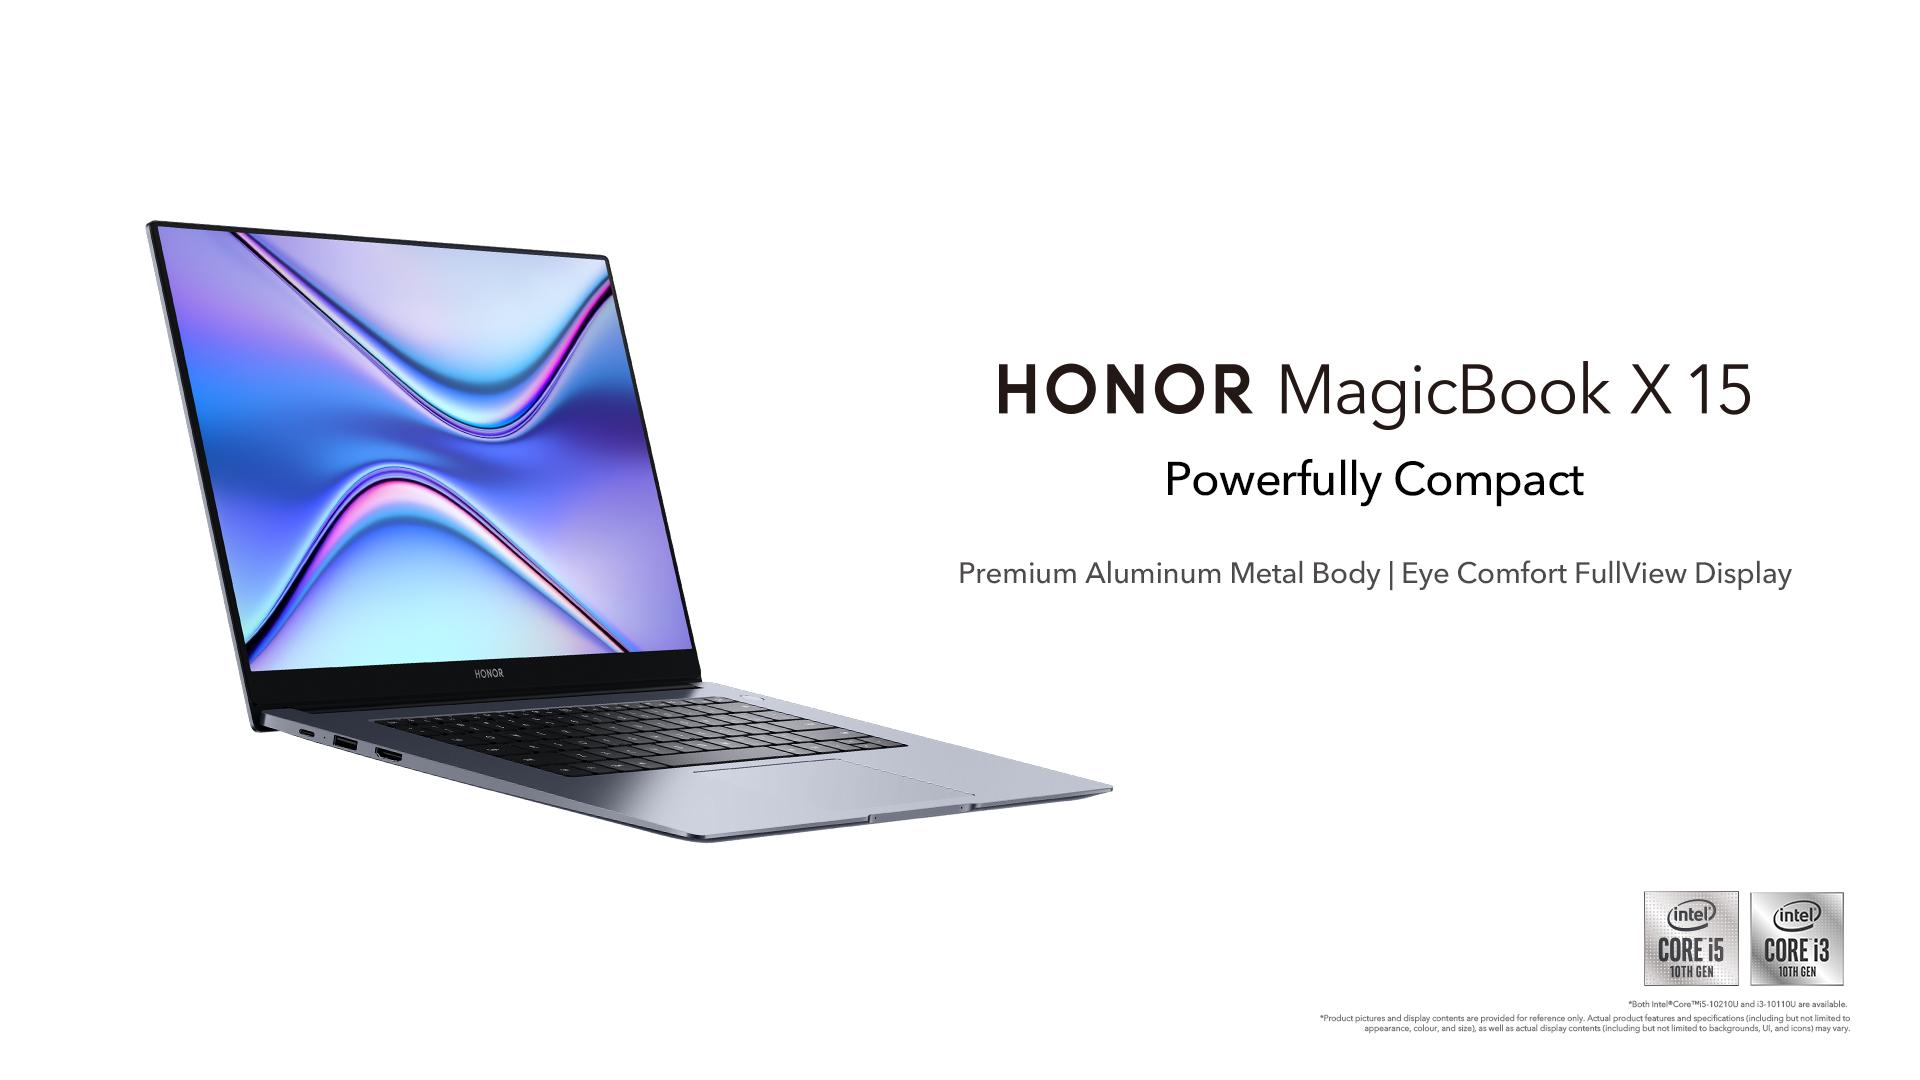 HONOR MagicBook X 15系列笔电6月19日开卖! 为 HONOR 50大马上市布局智能互联 13